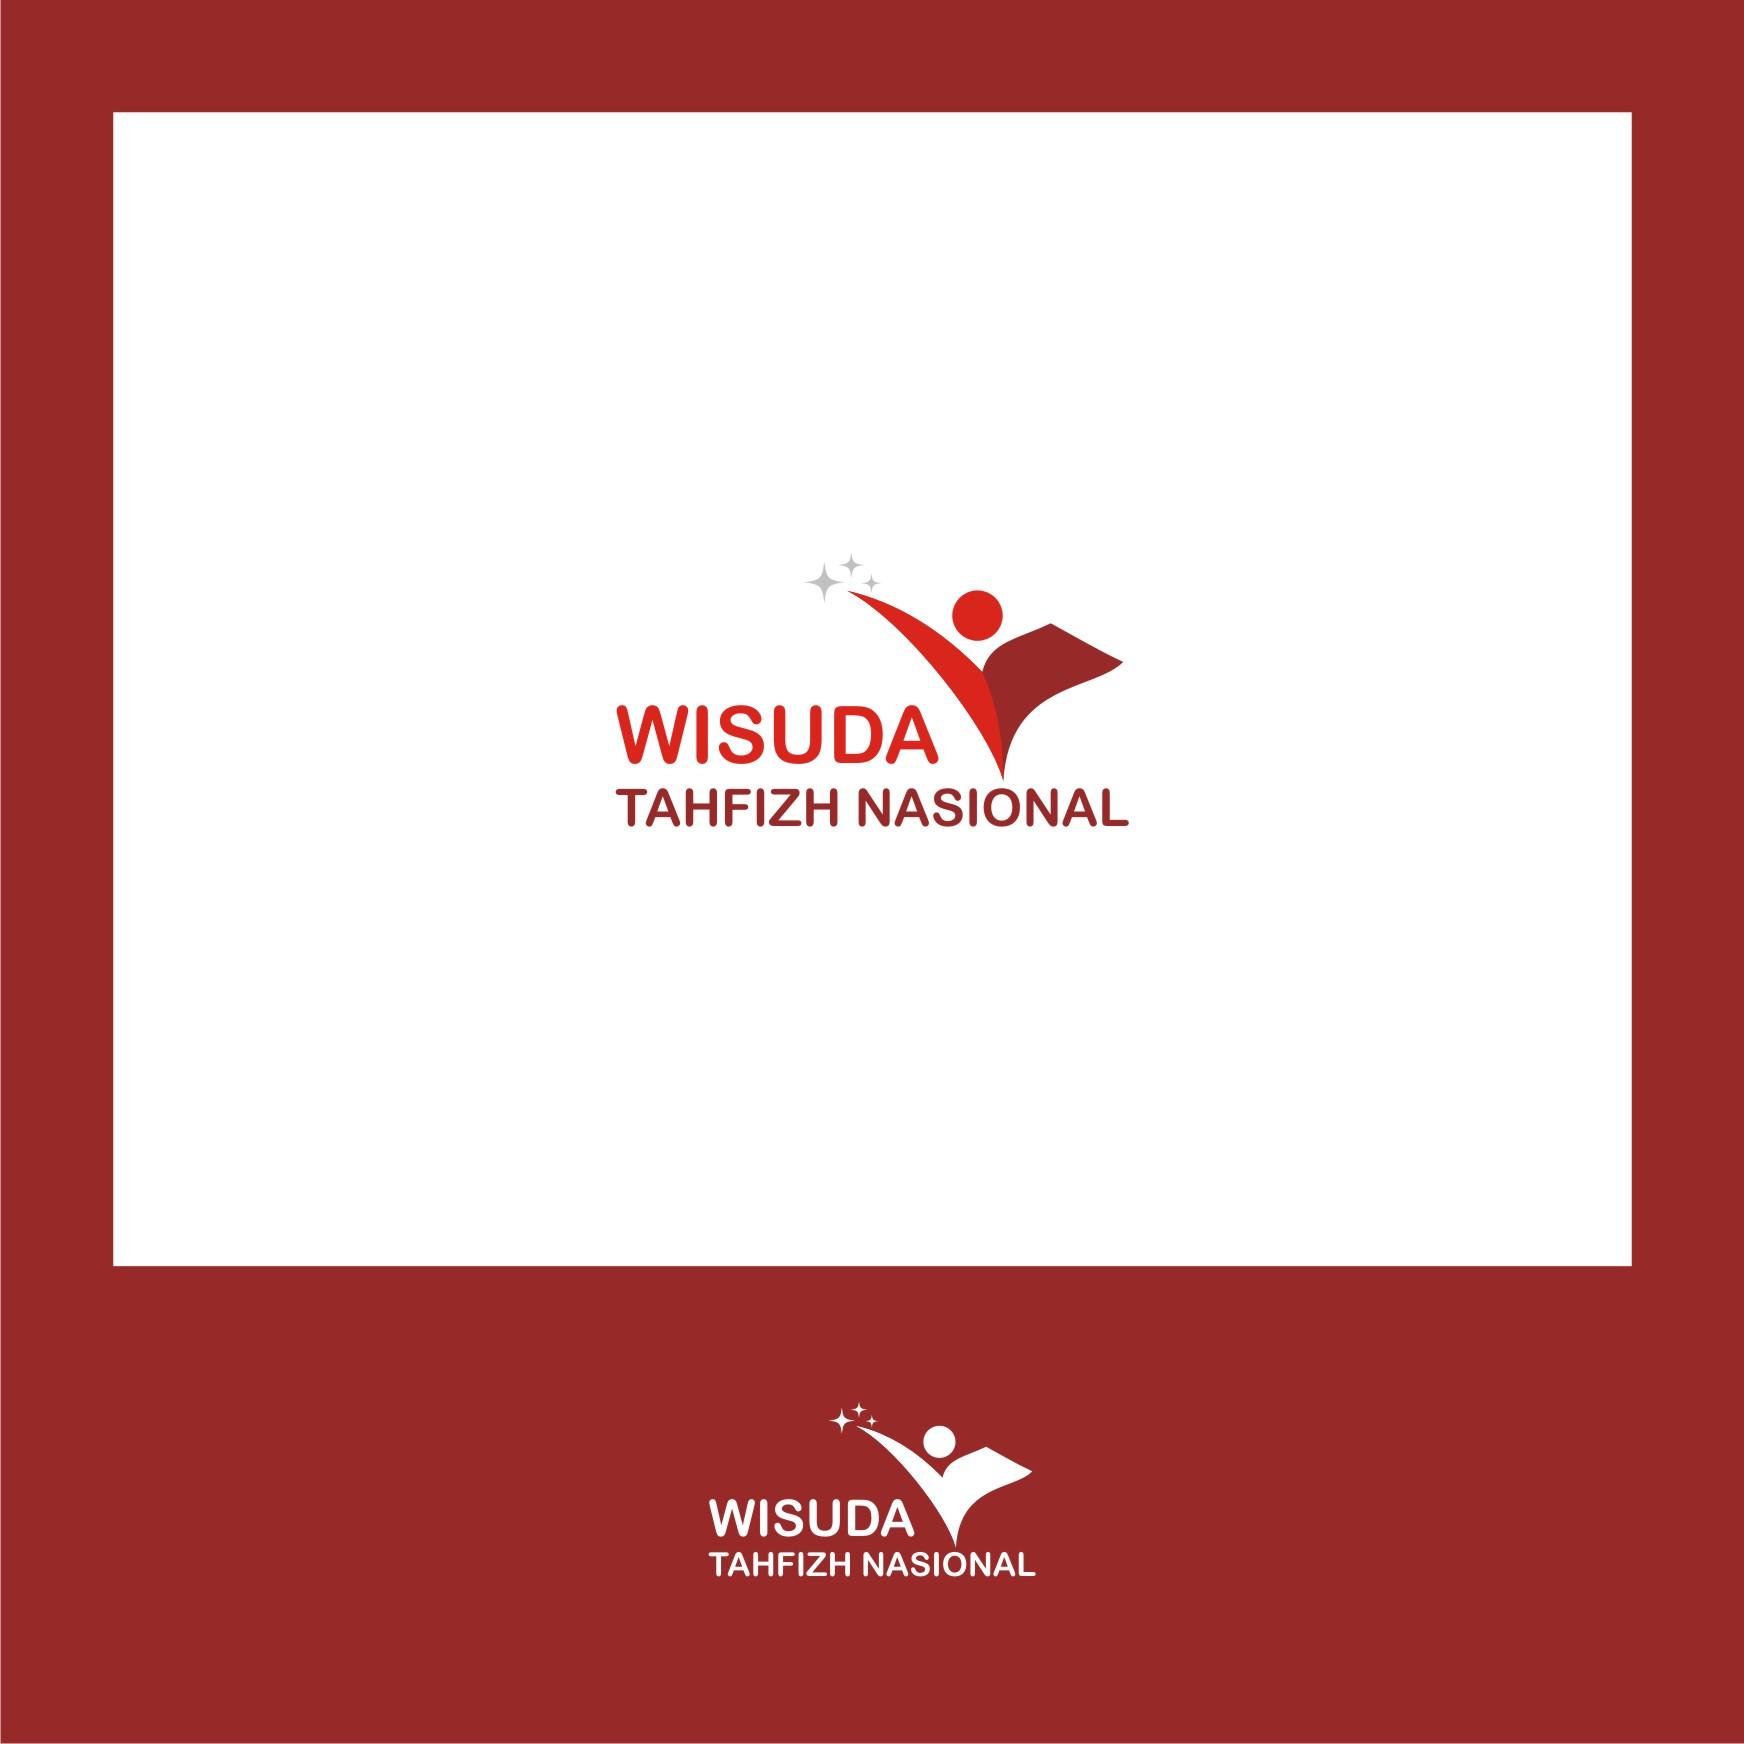 Design banner wisuda - 079883b45b